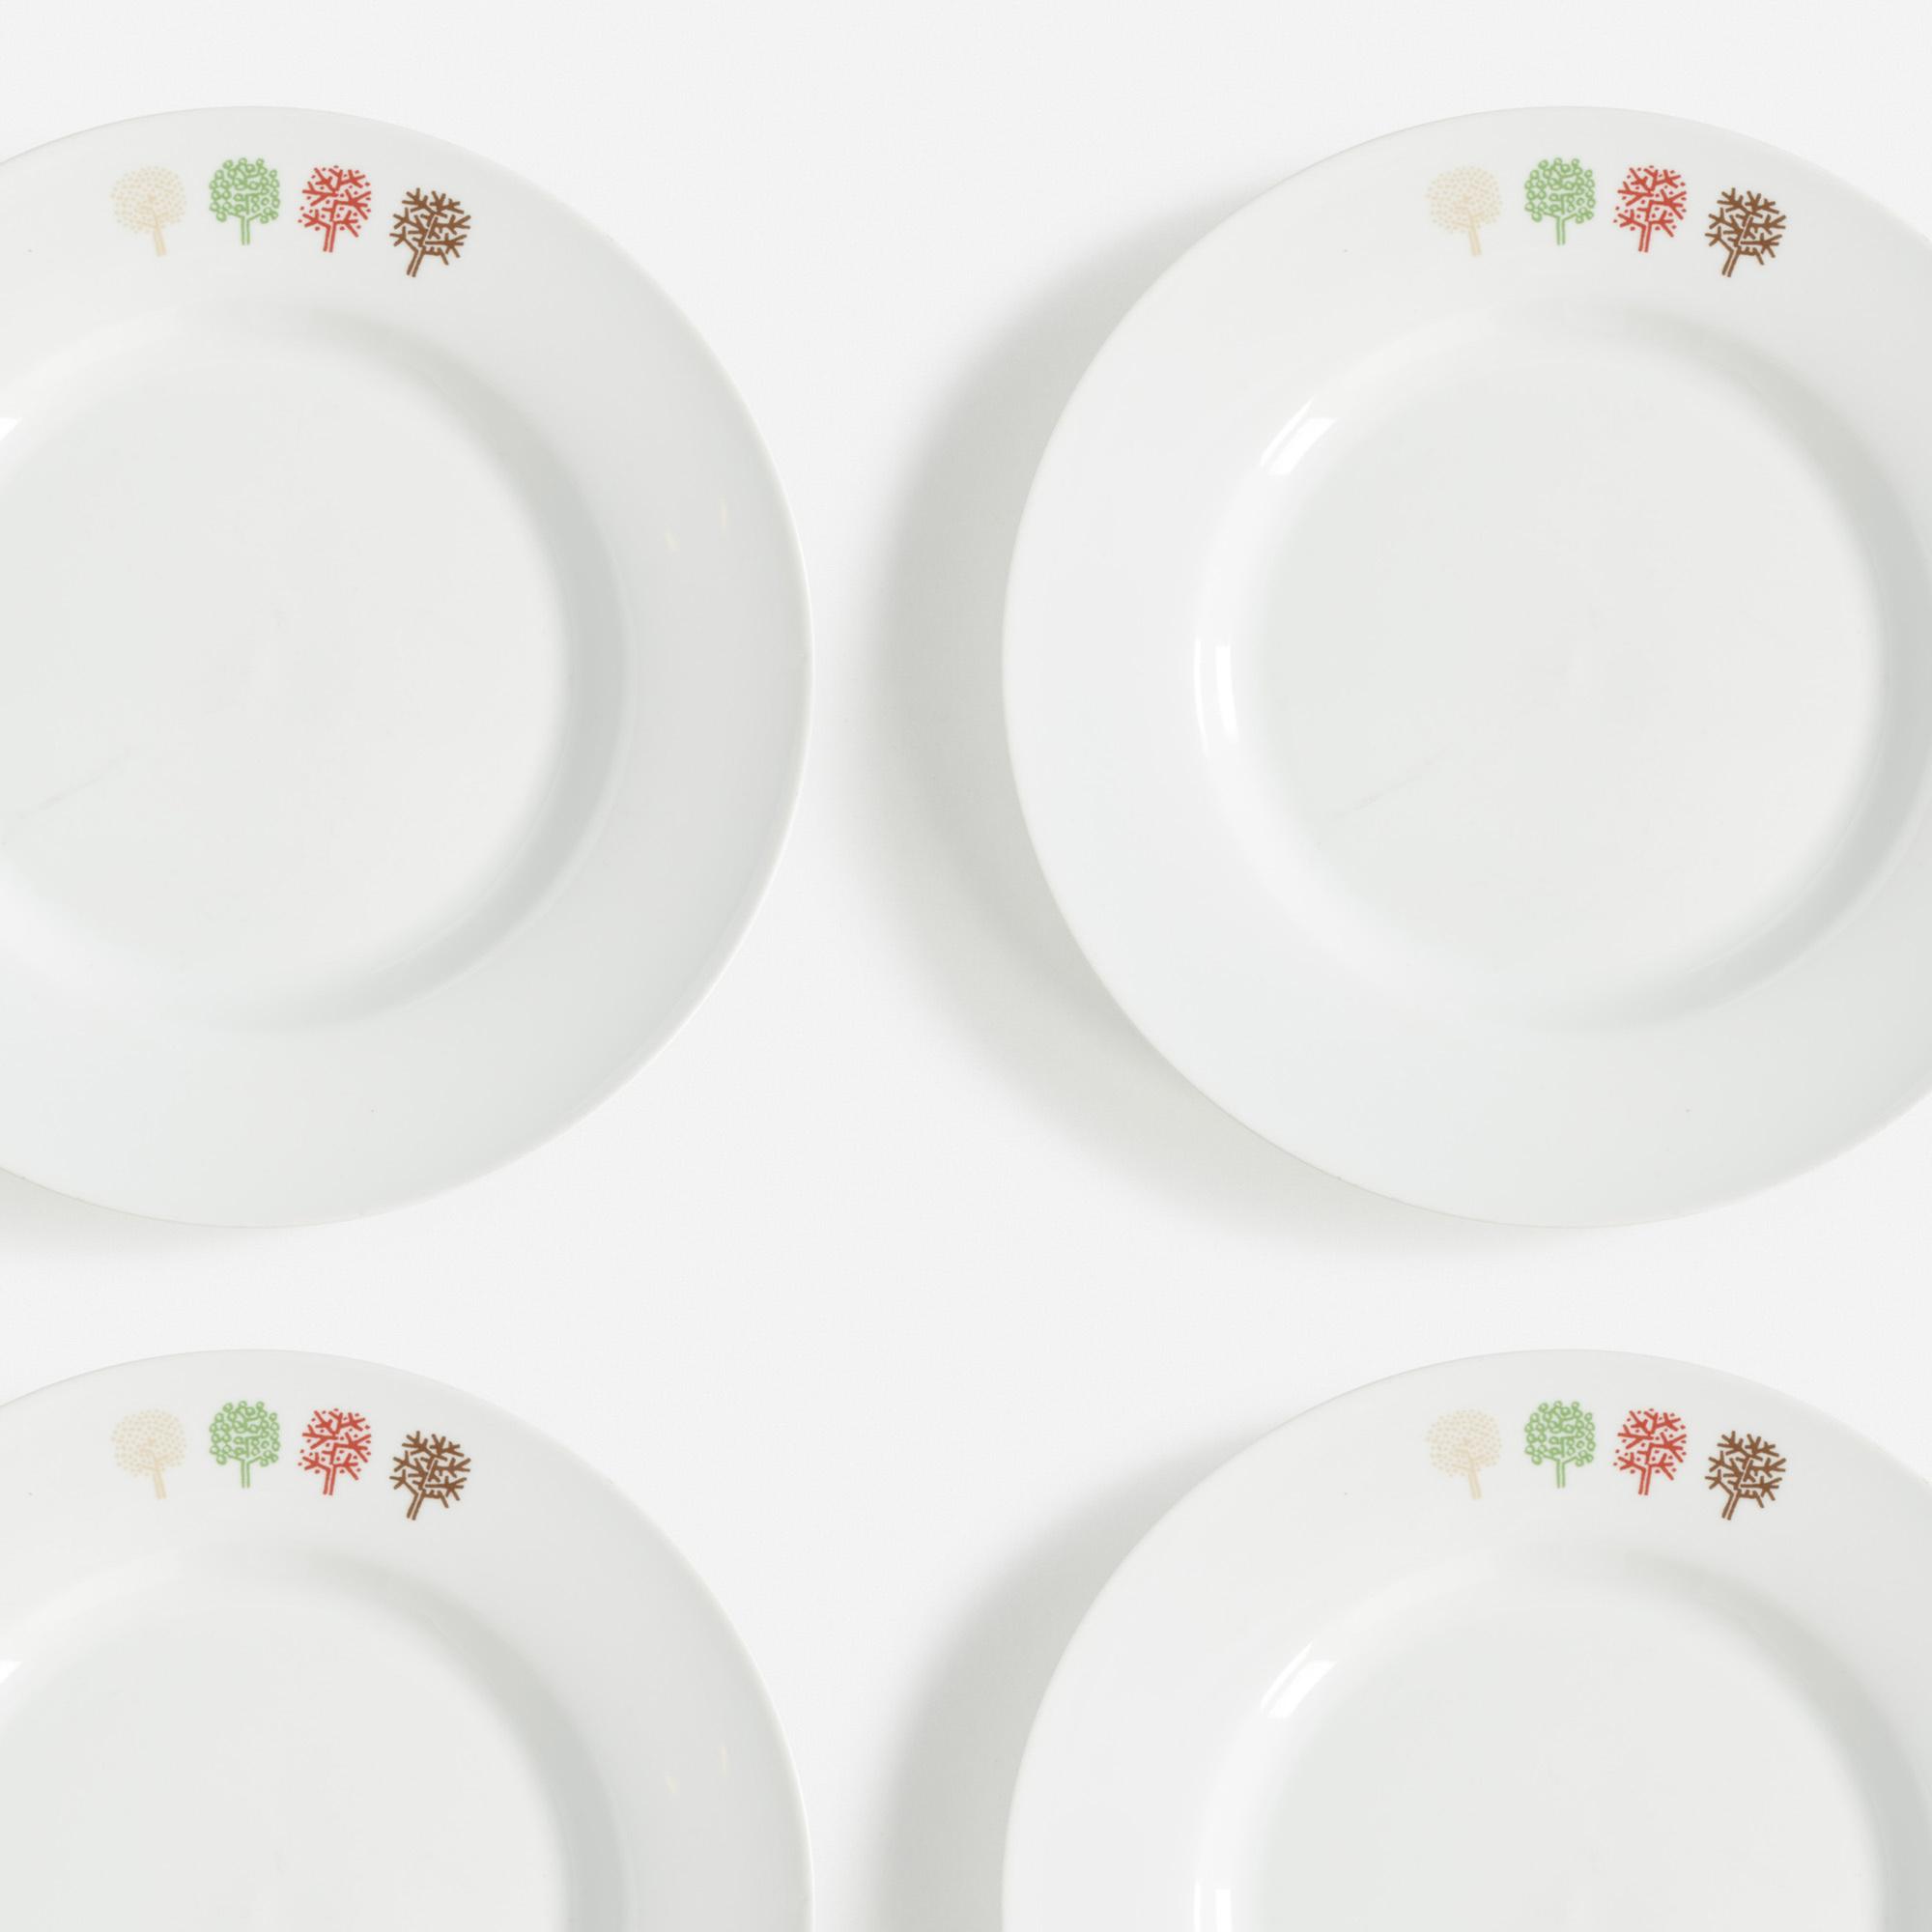 441:  / Four Seasons plates, set of twelve (1 of 1)